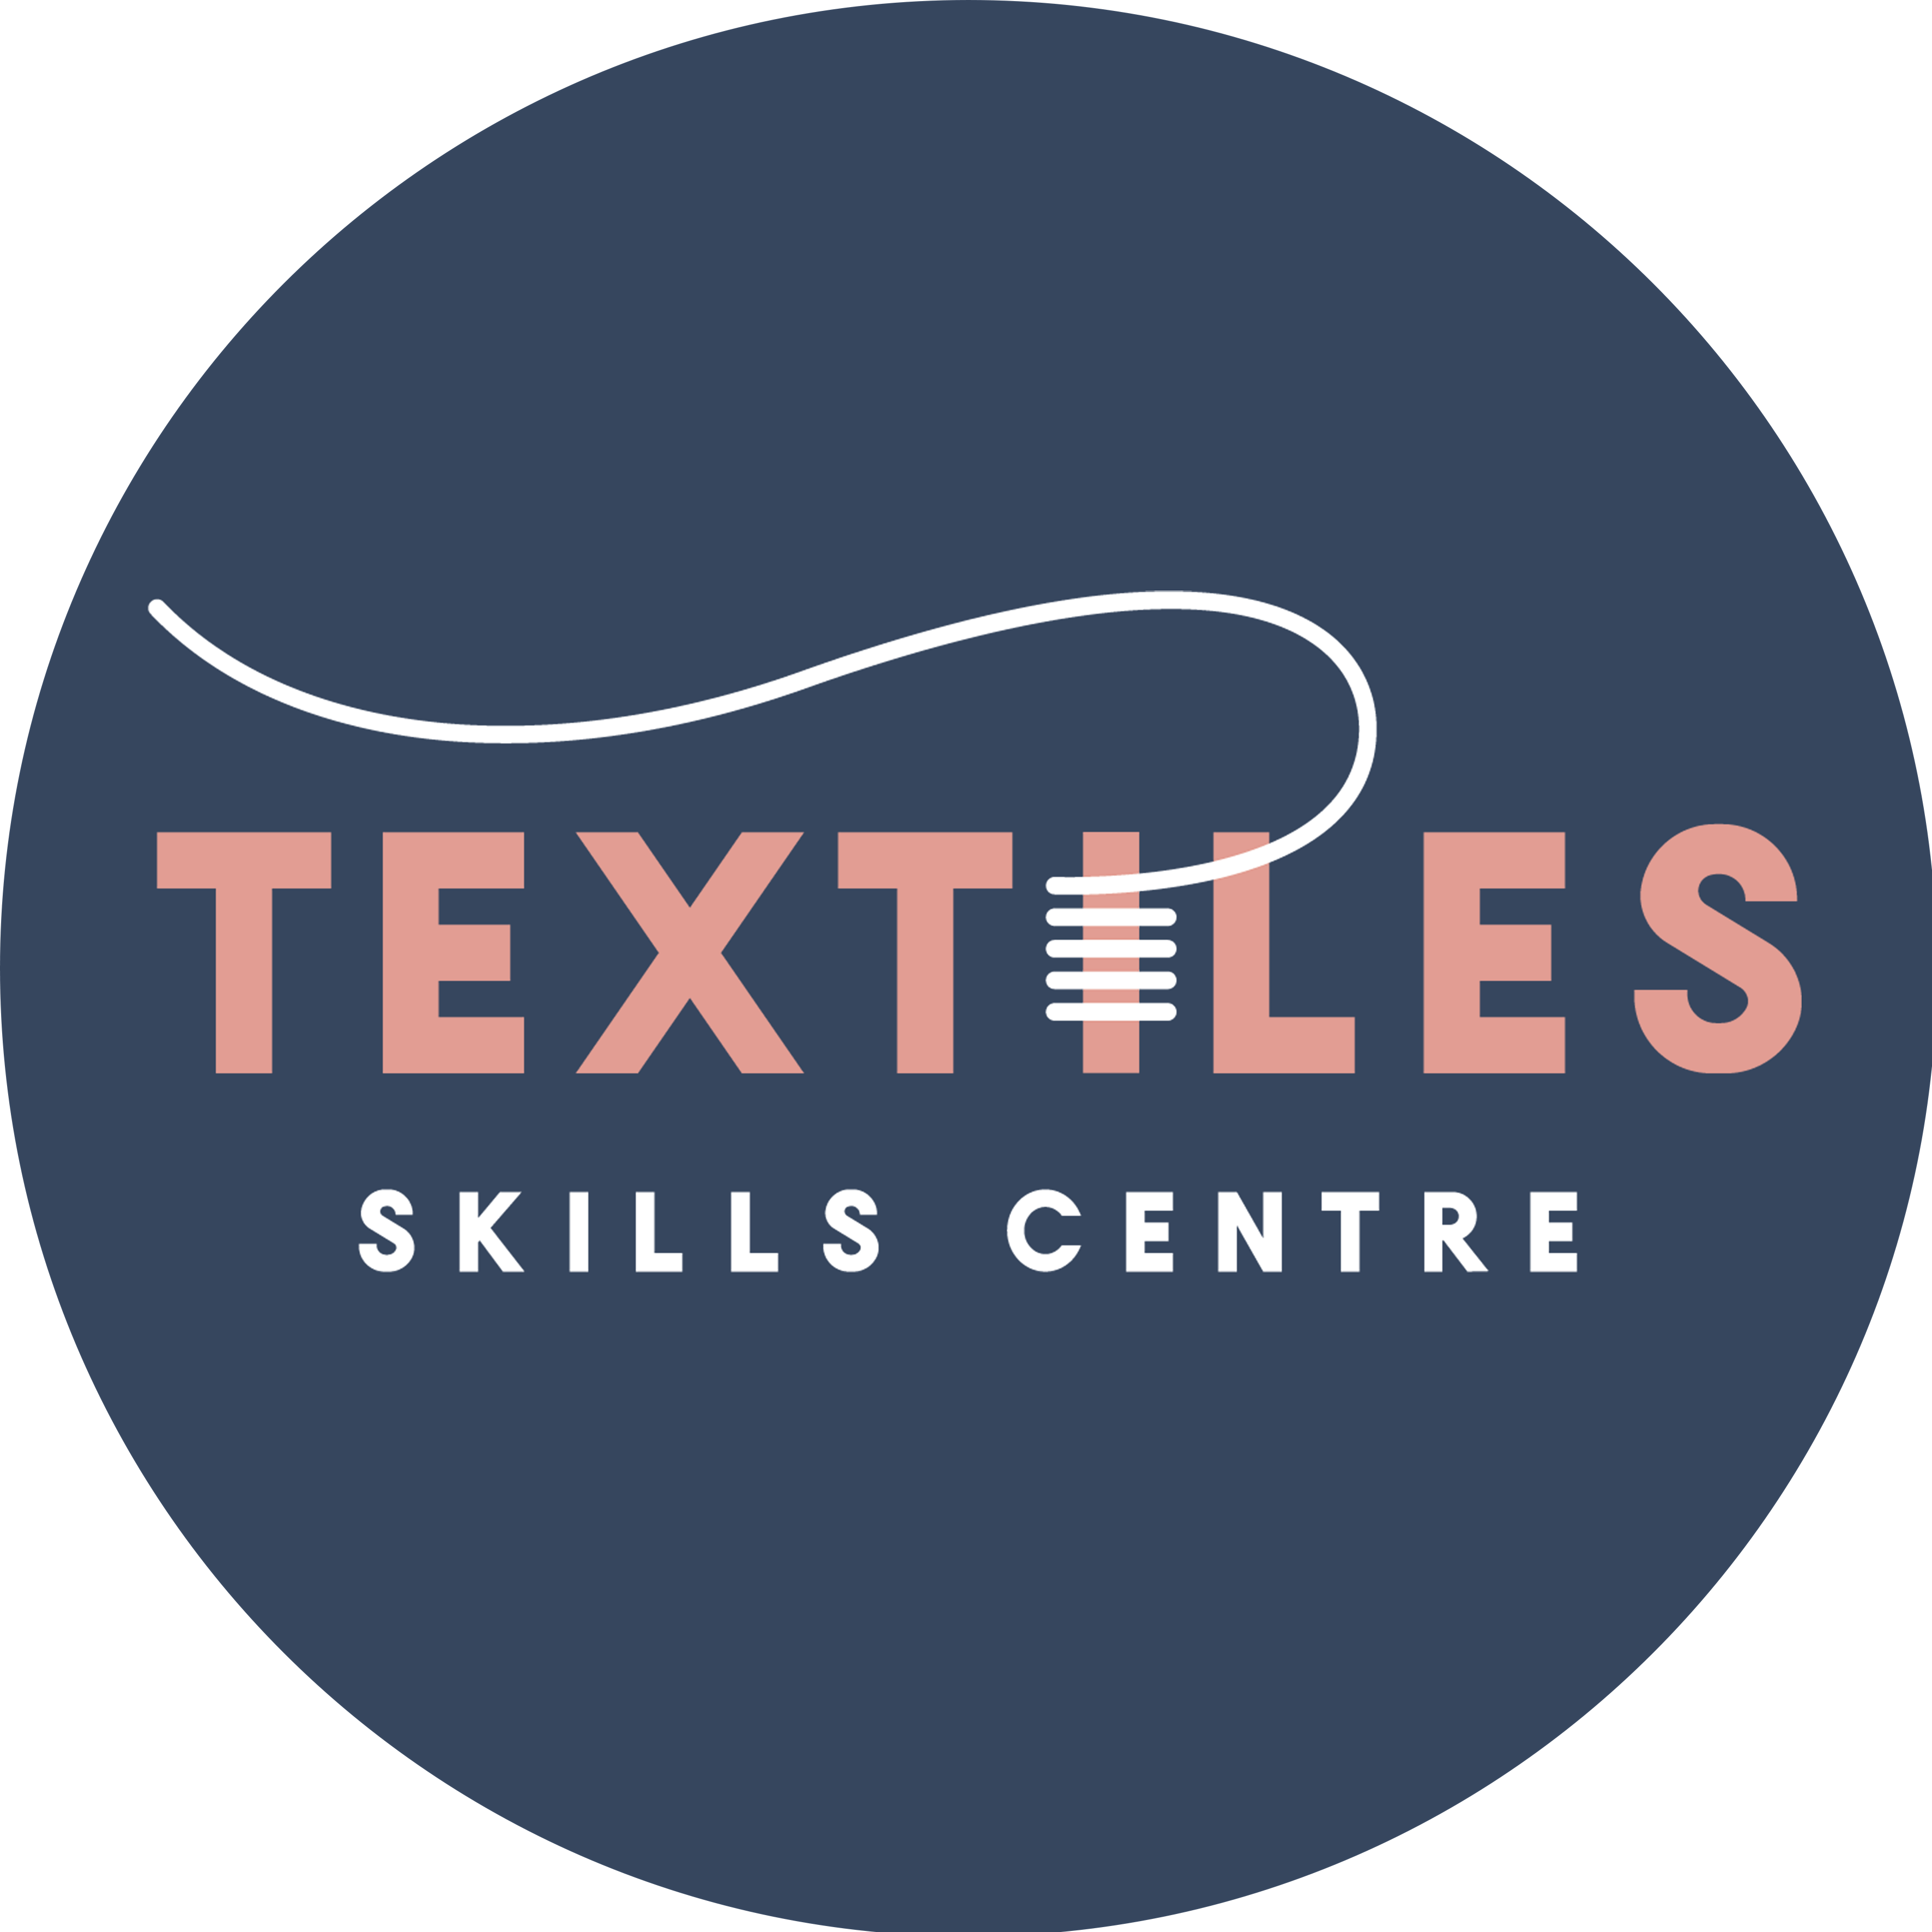 Textiles Skills Centre